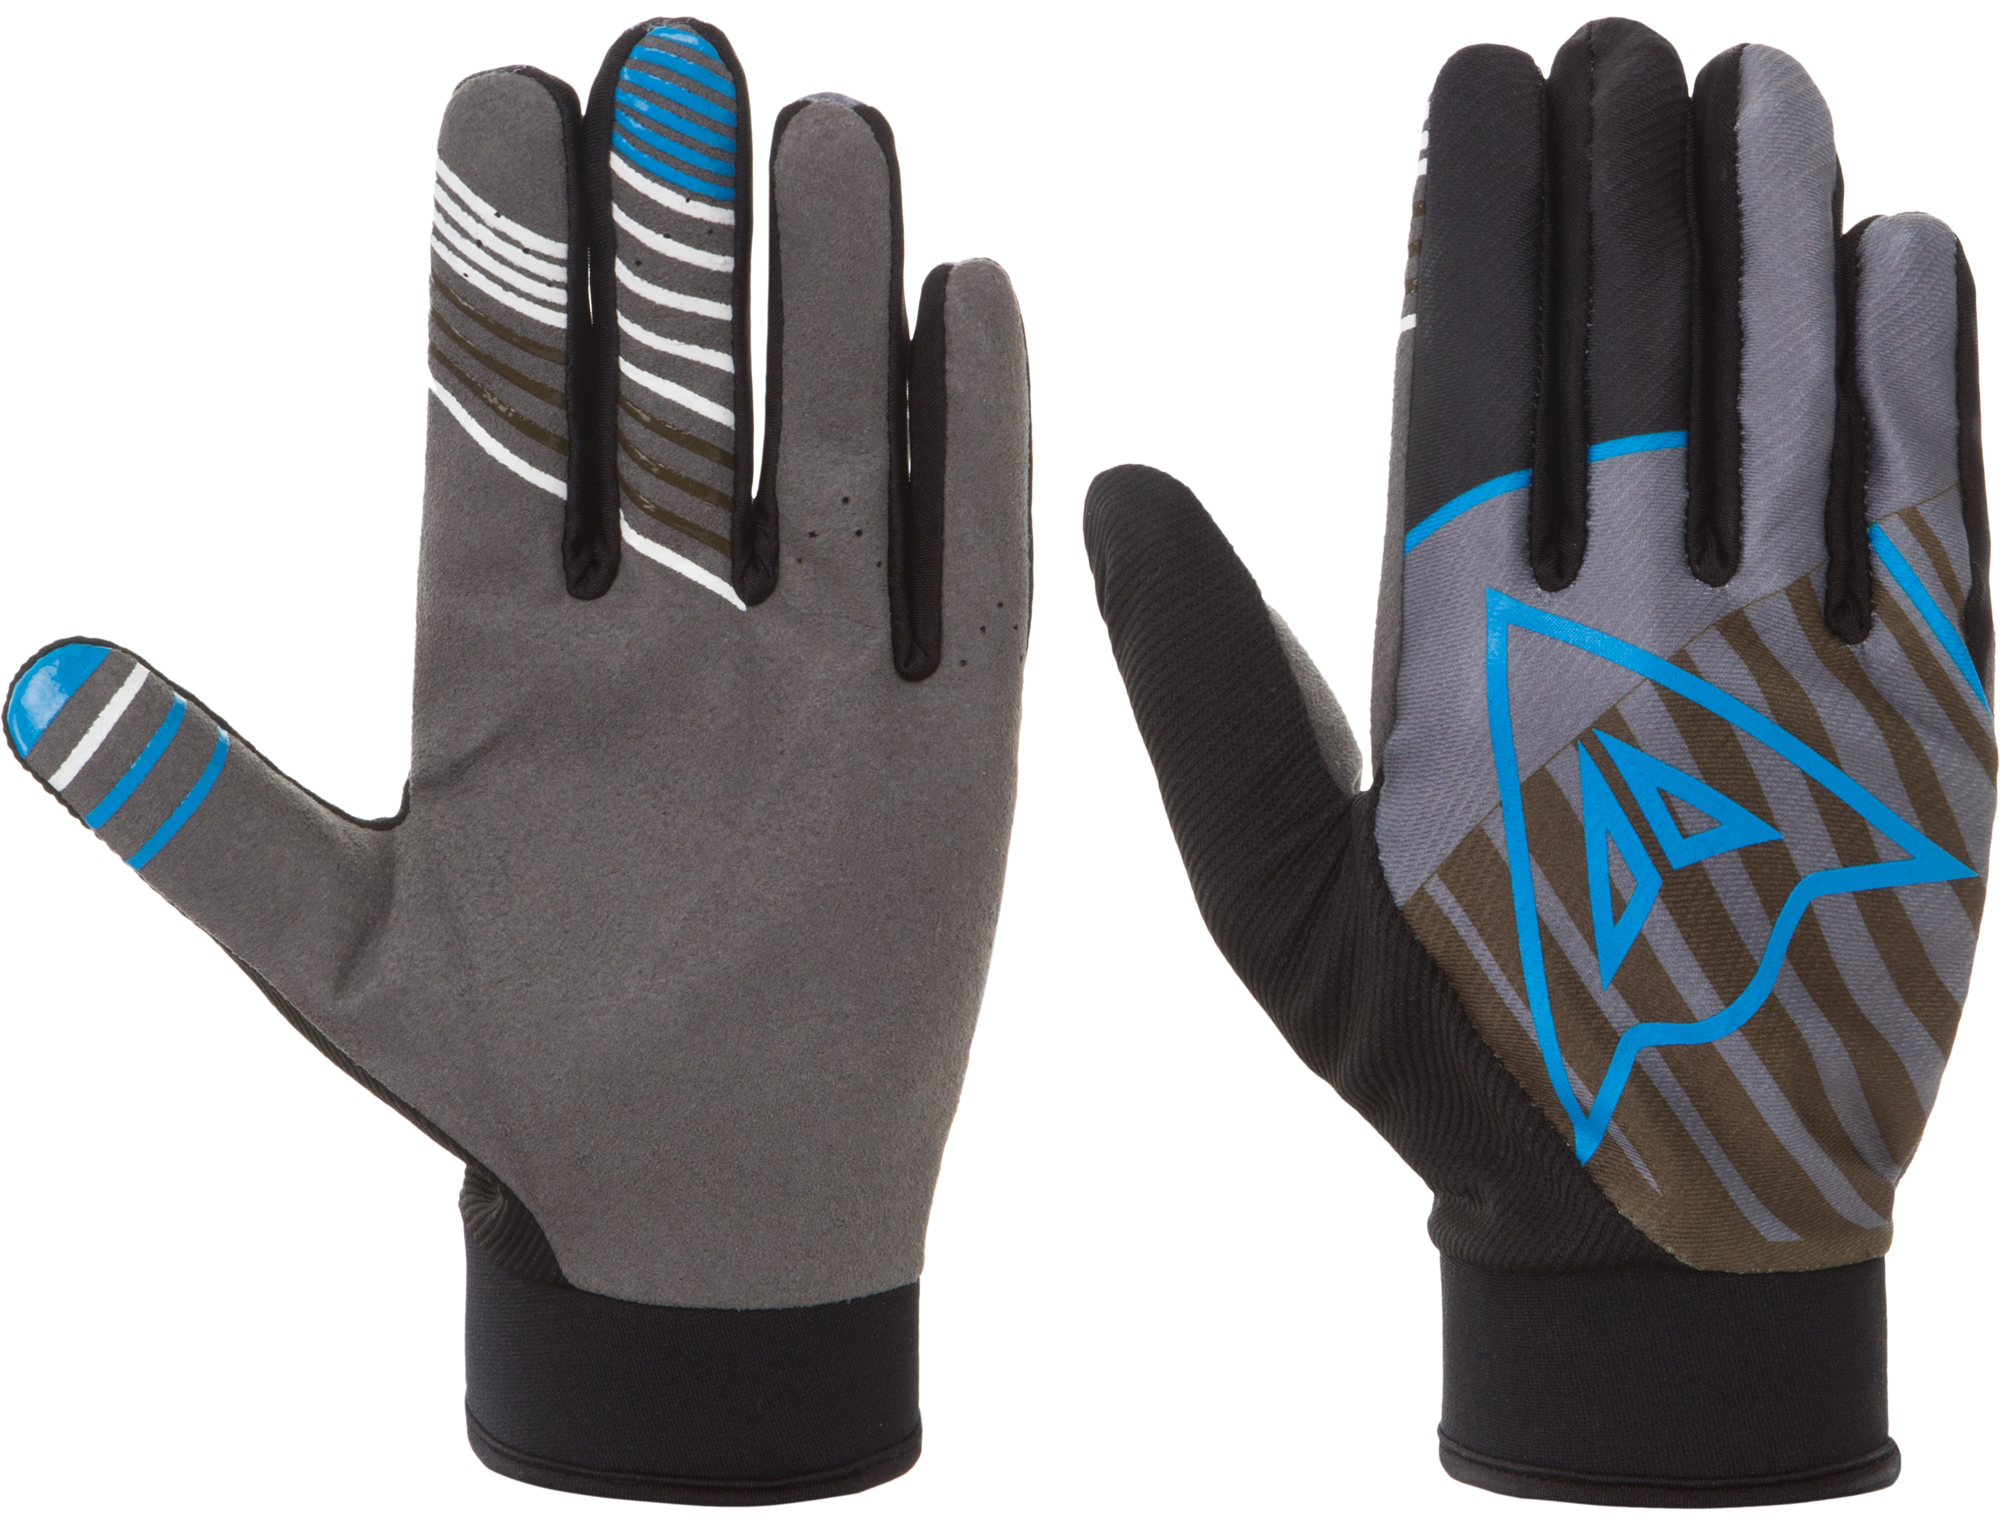 Dainese Велосипедные перчатки Dainese Dare велосипедные перчатки mai senlan m81013